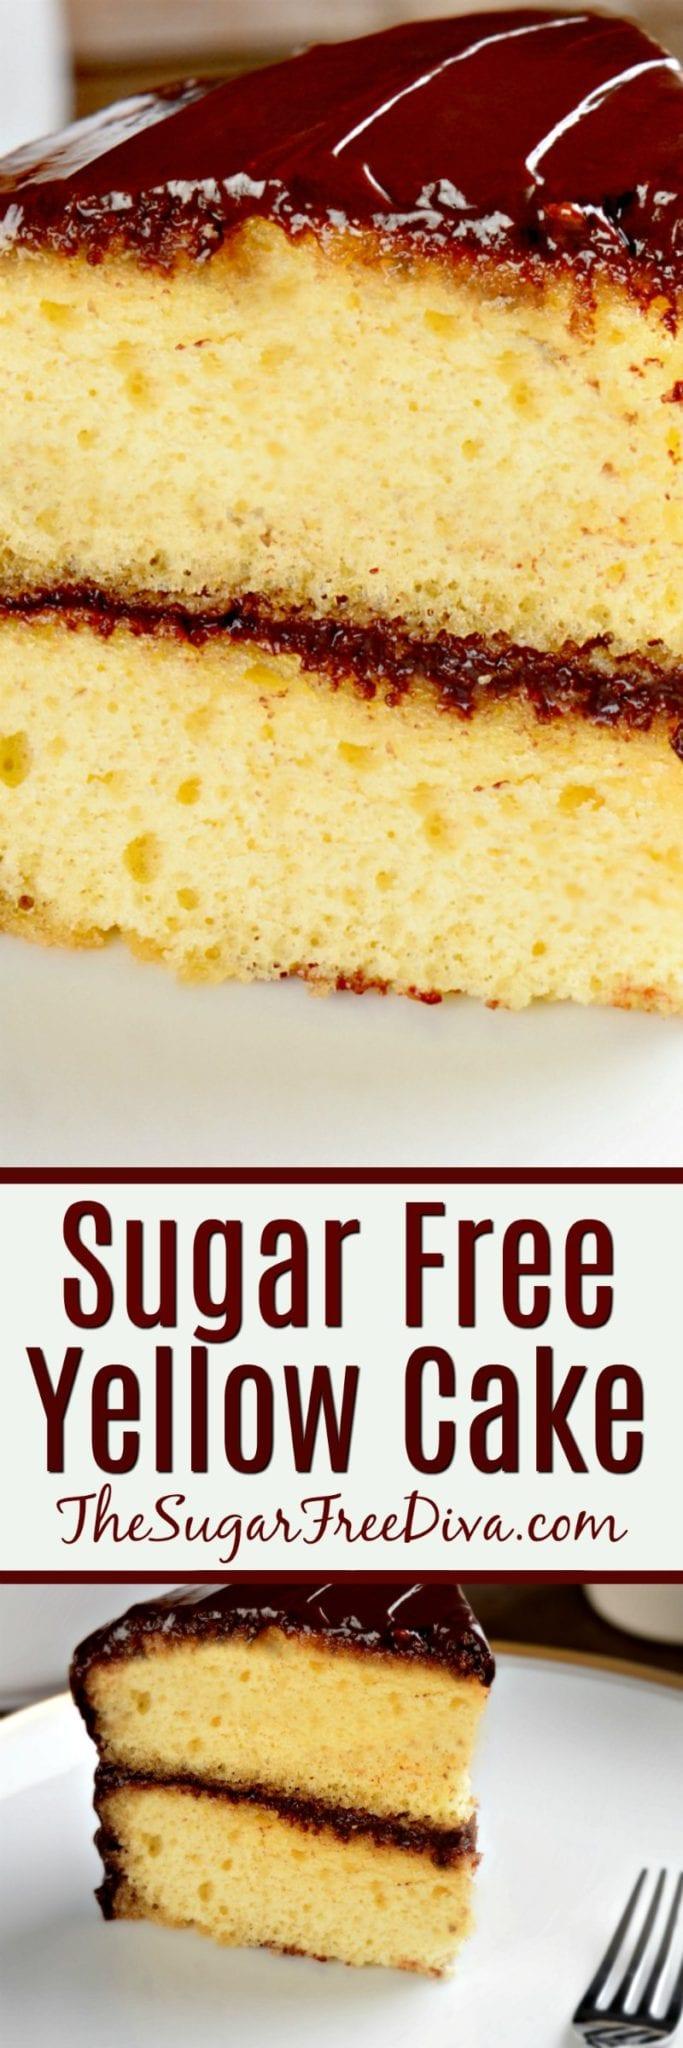 How To Bake A Sugar Free Birthday Cake